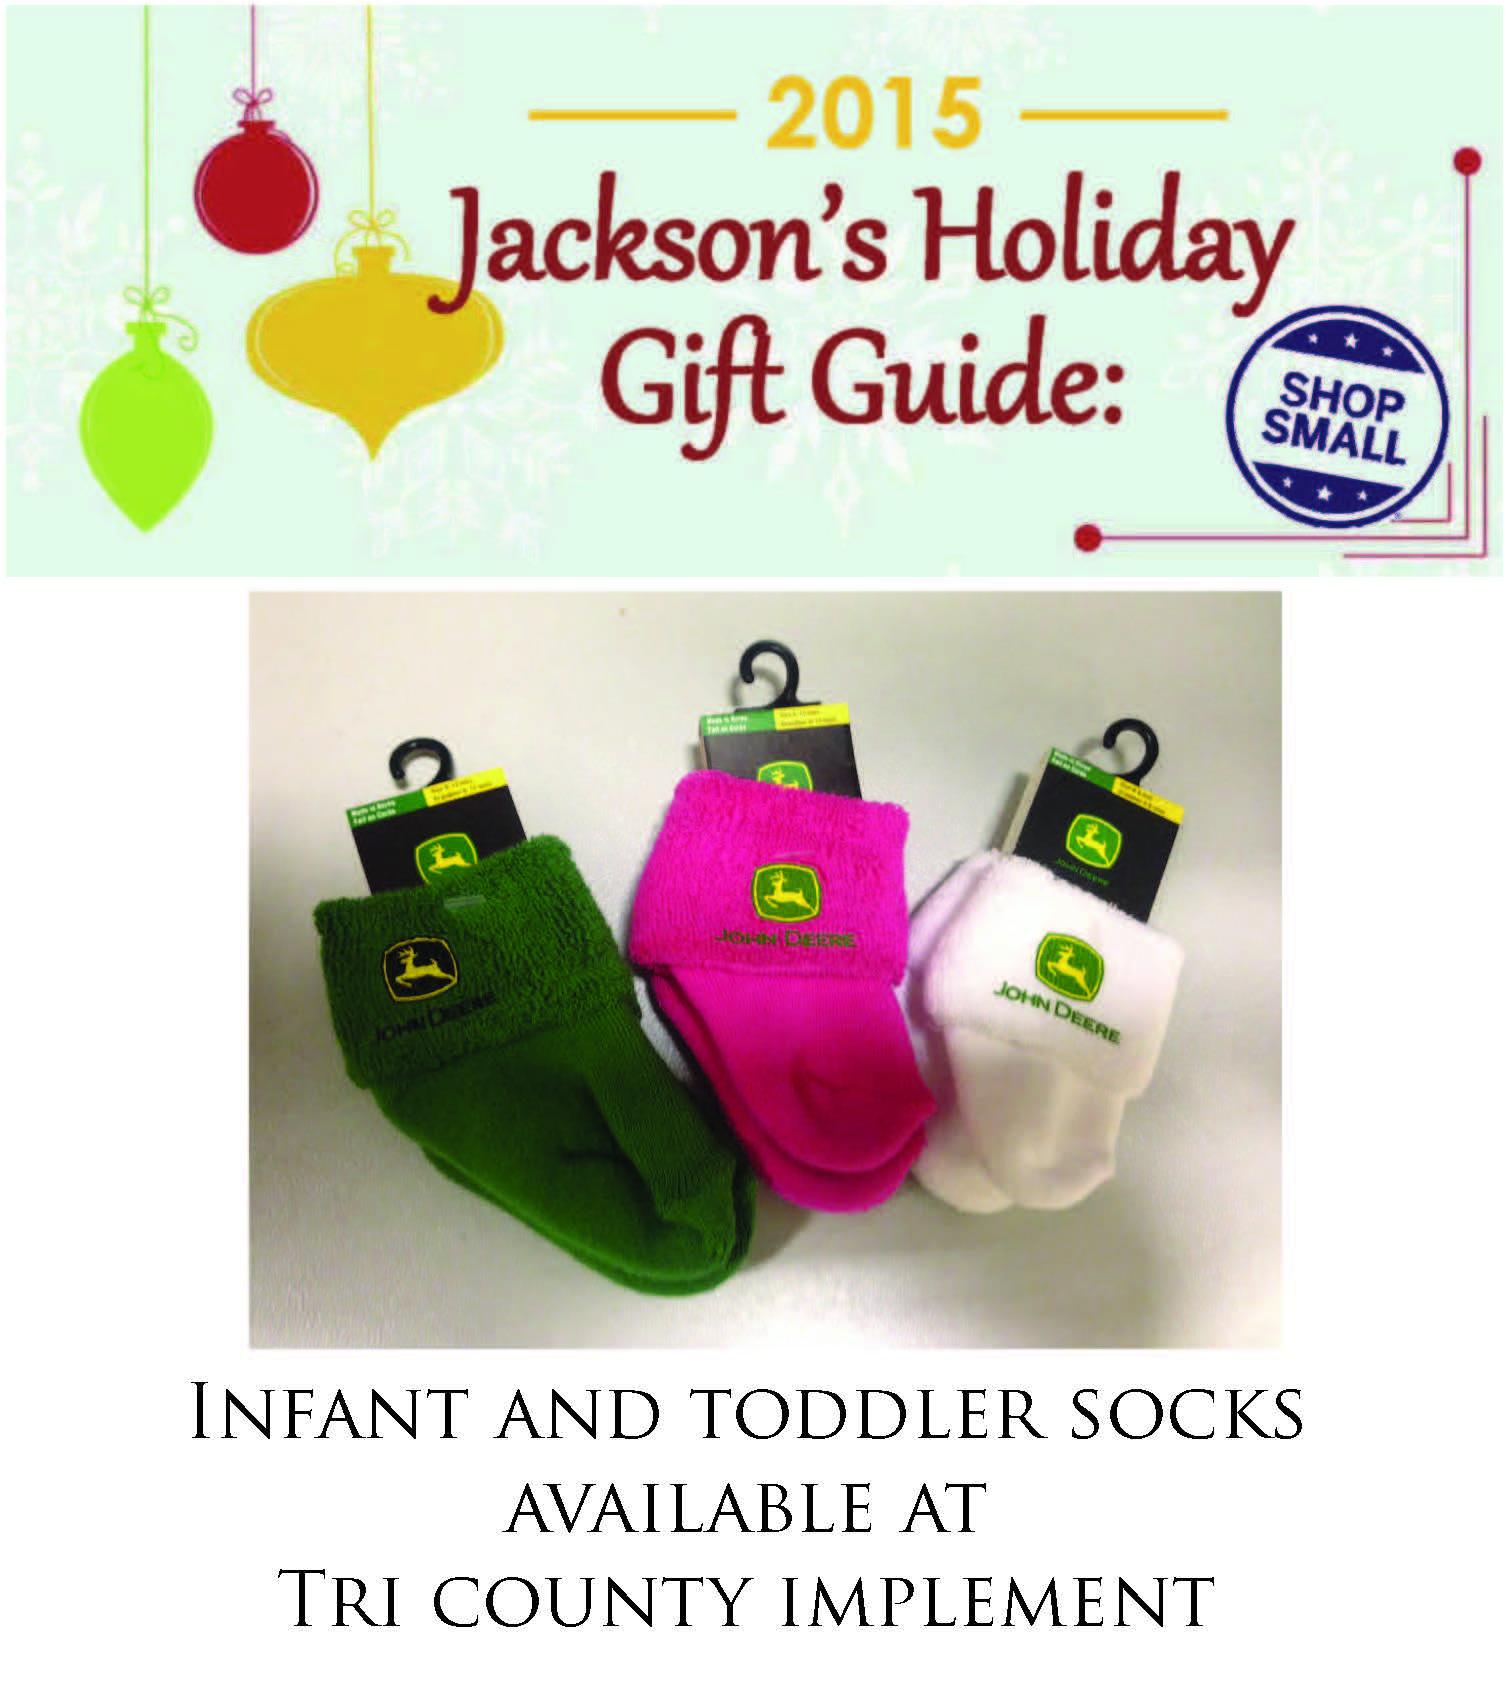 Gift_Guide_TriCounty2.jpg